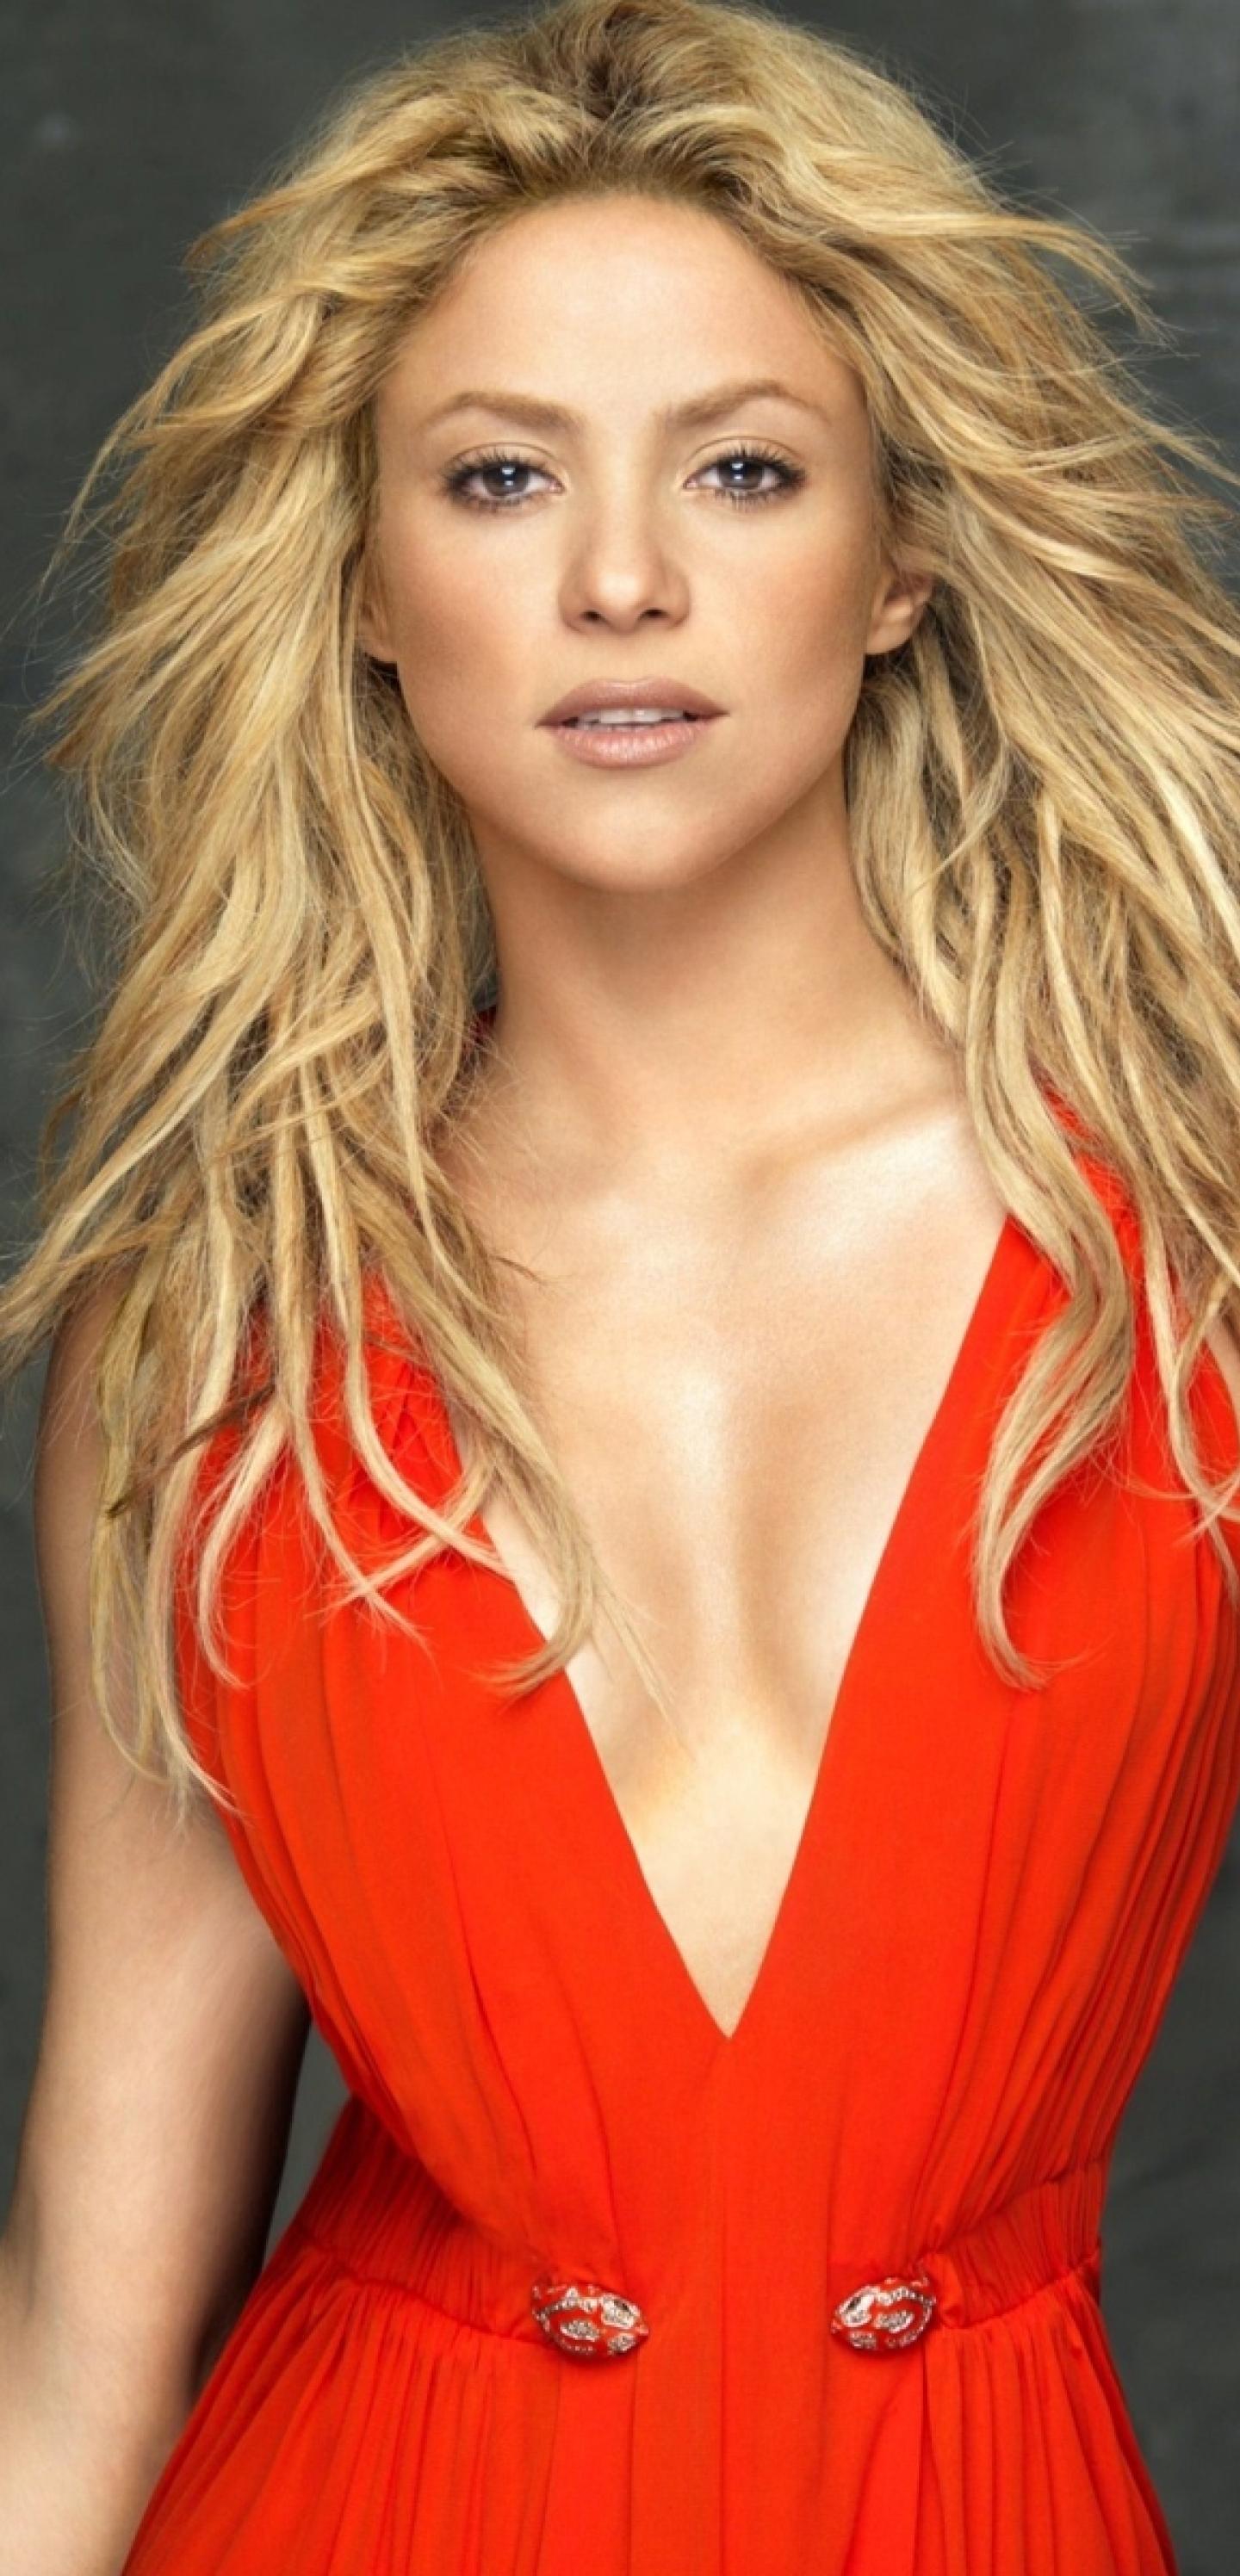 1440x2992 Shakira Hot Red Dress wallpaper 1440x2992